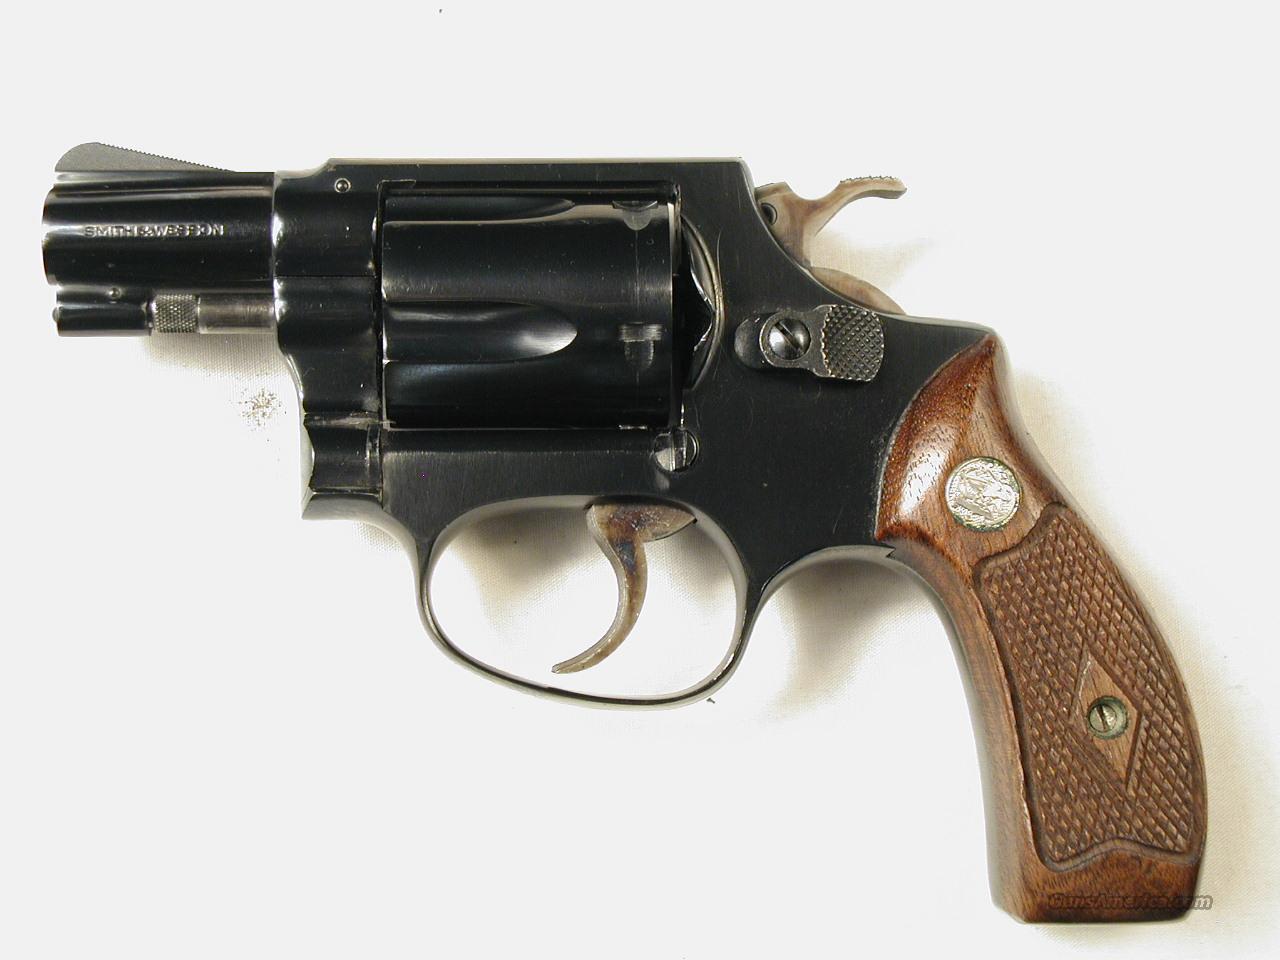 36  Guns > Pistols > Smith & Wesson Revolvers > Pocket Pistols